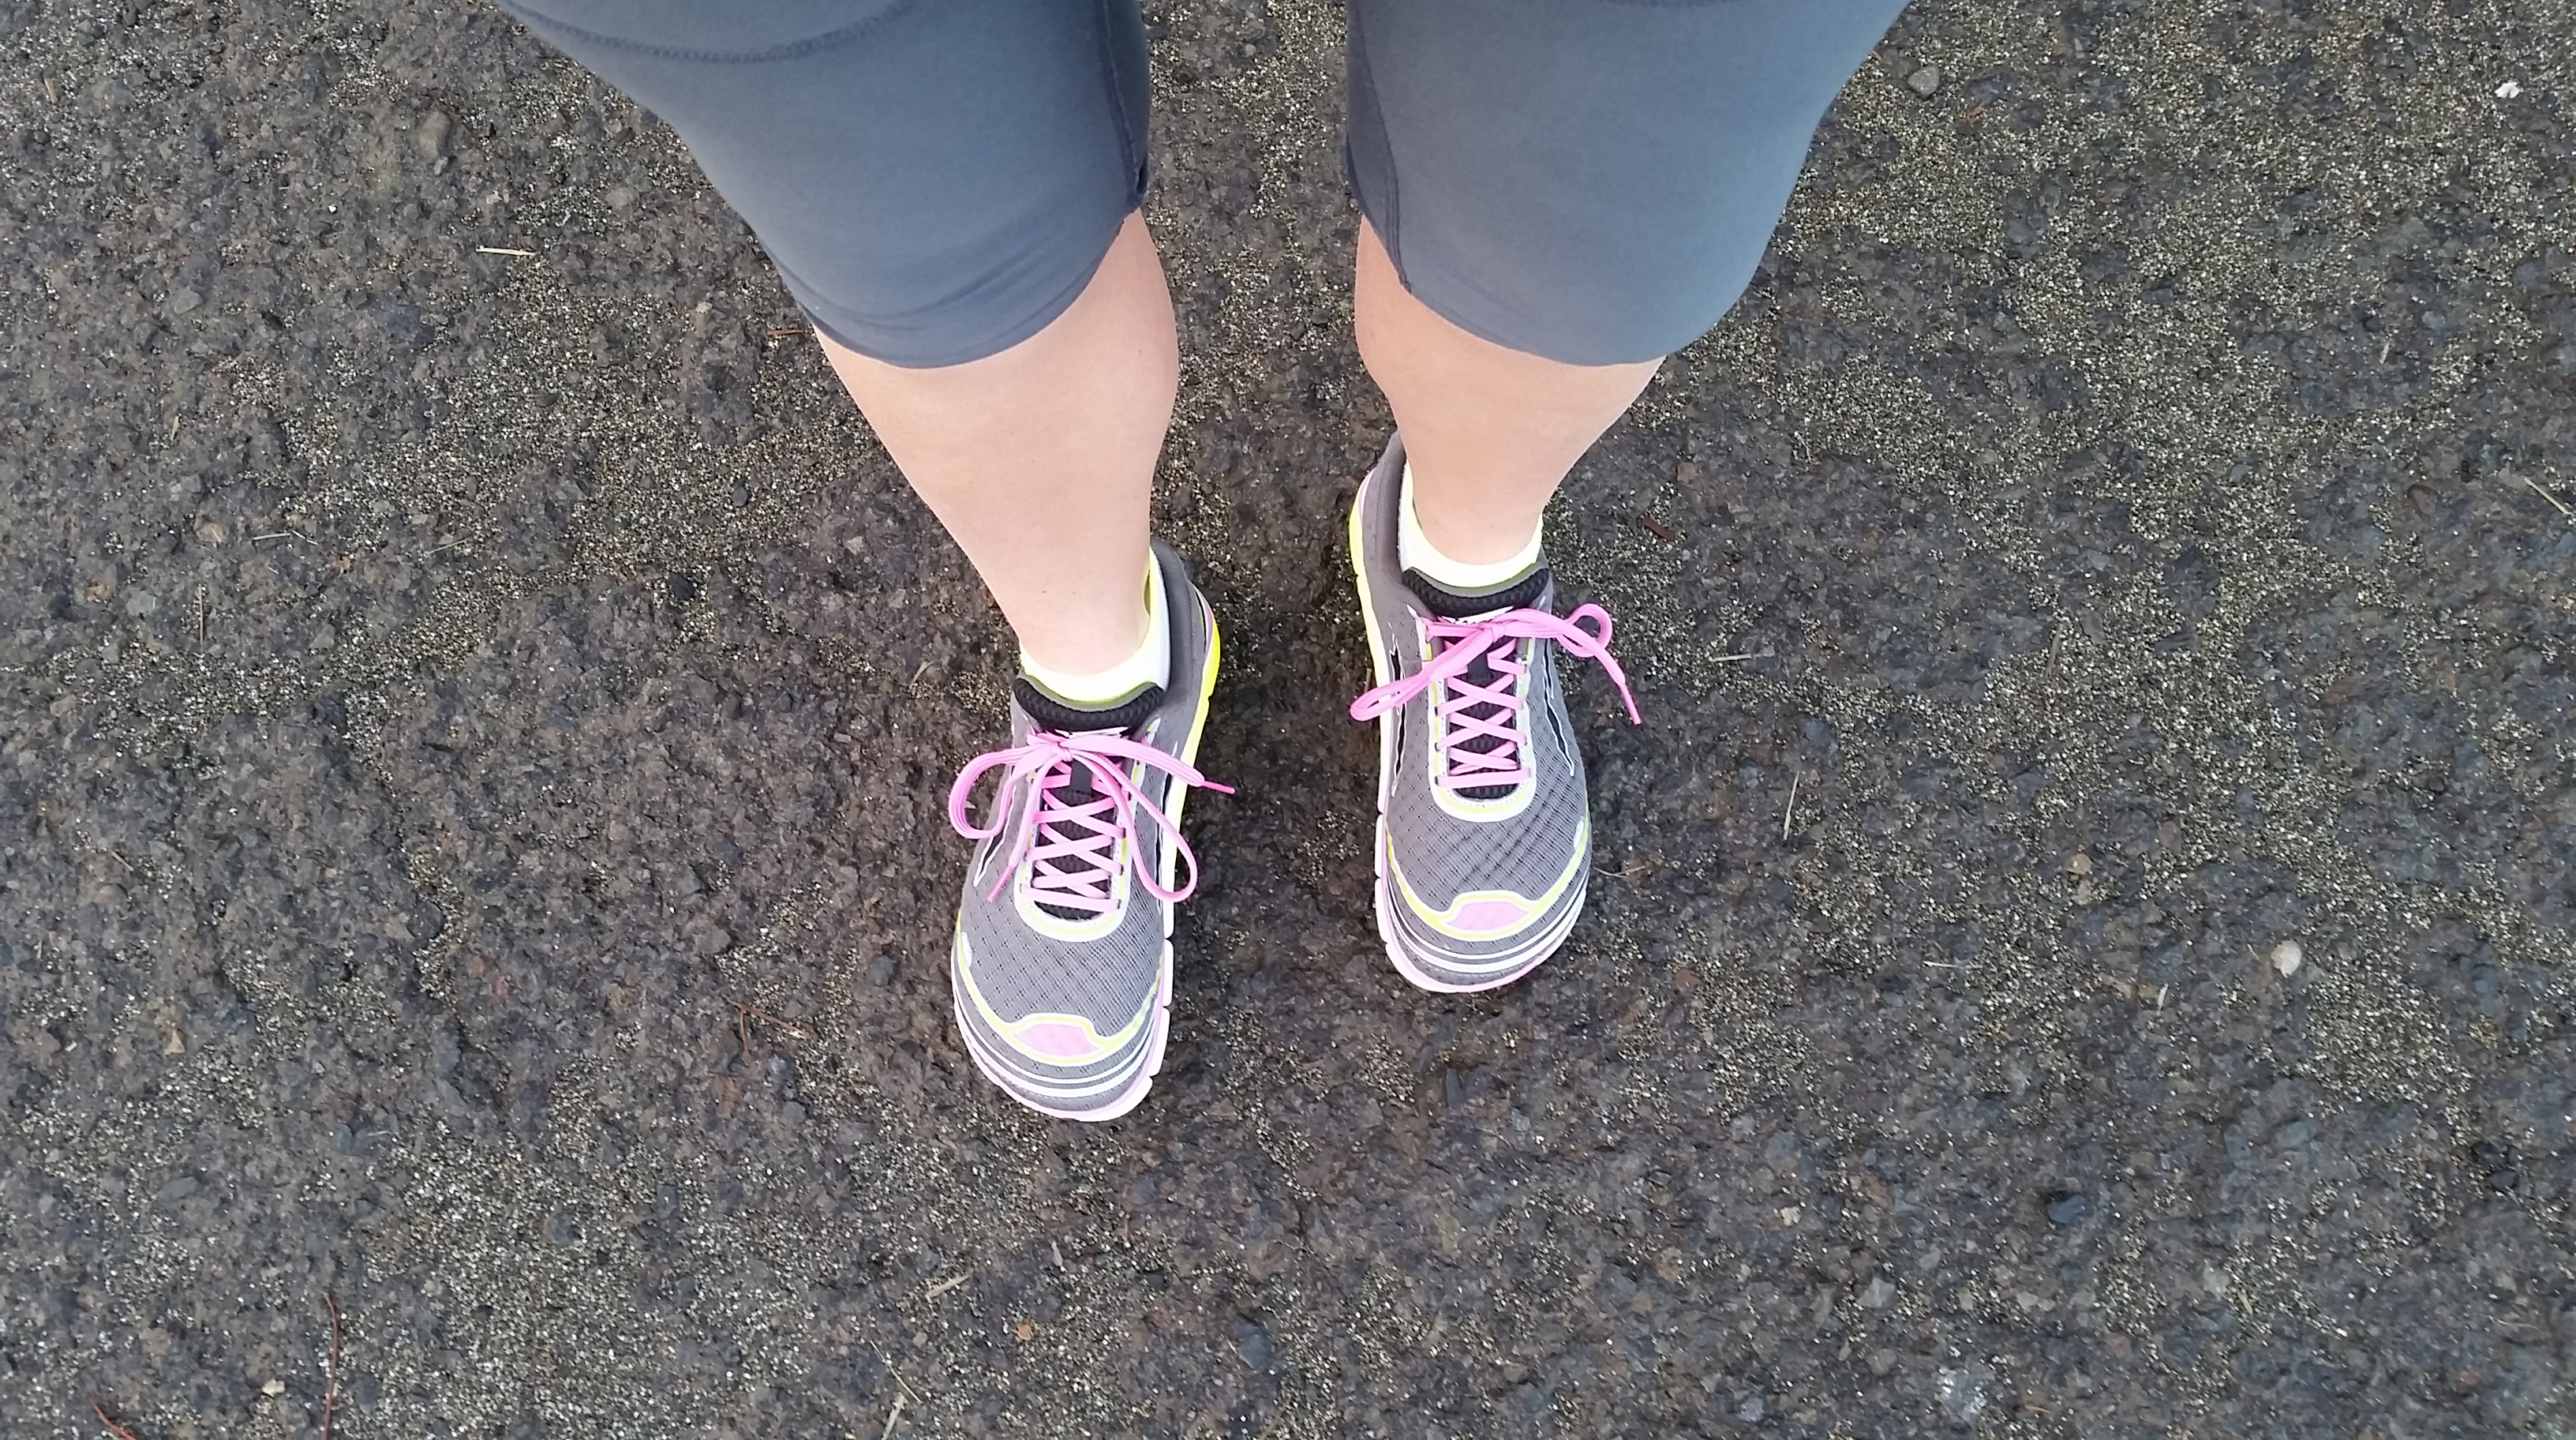 Shoe Review: Altra Running Women's